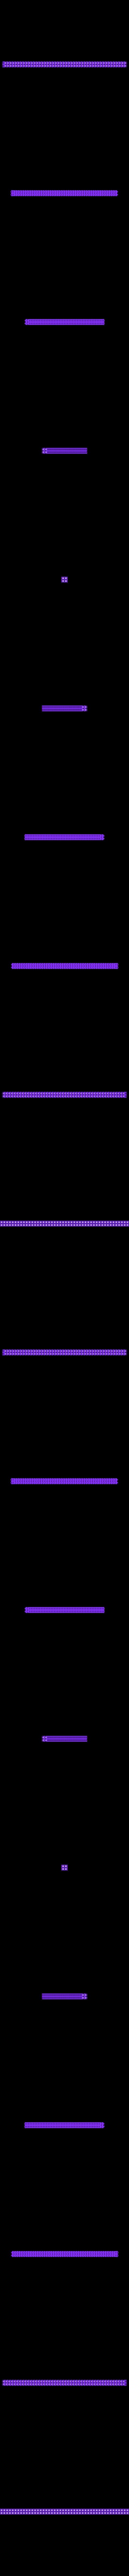 antiwarp_long_pole_2x2.stl Download free STL file Anti-Warping Block, Truncated Octahedrons • Model to 3D print, zootopia3Dprints